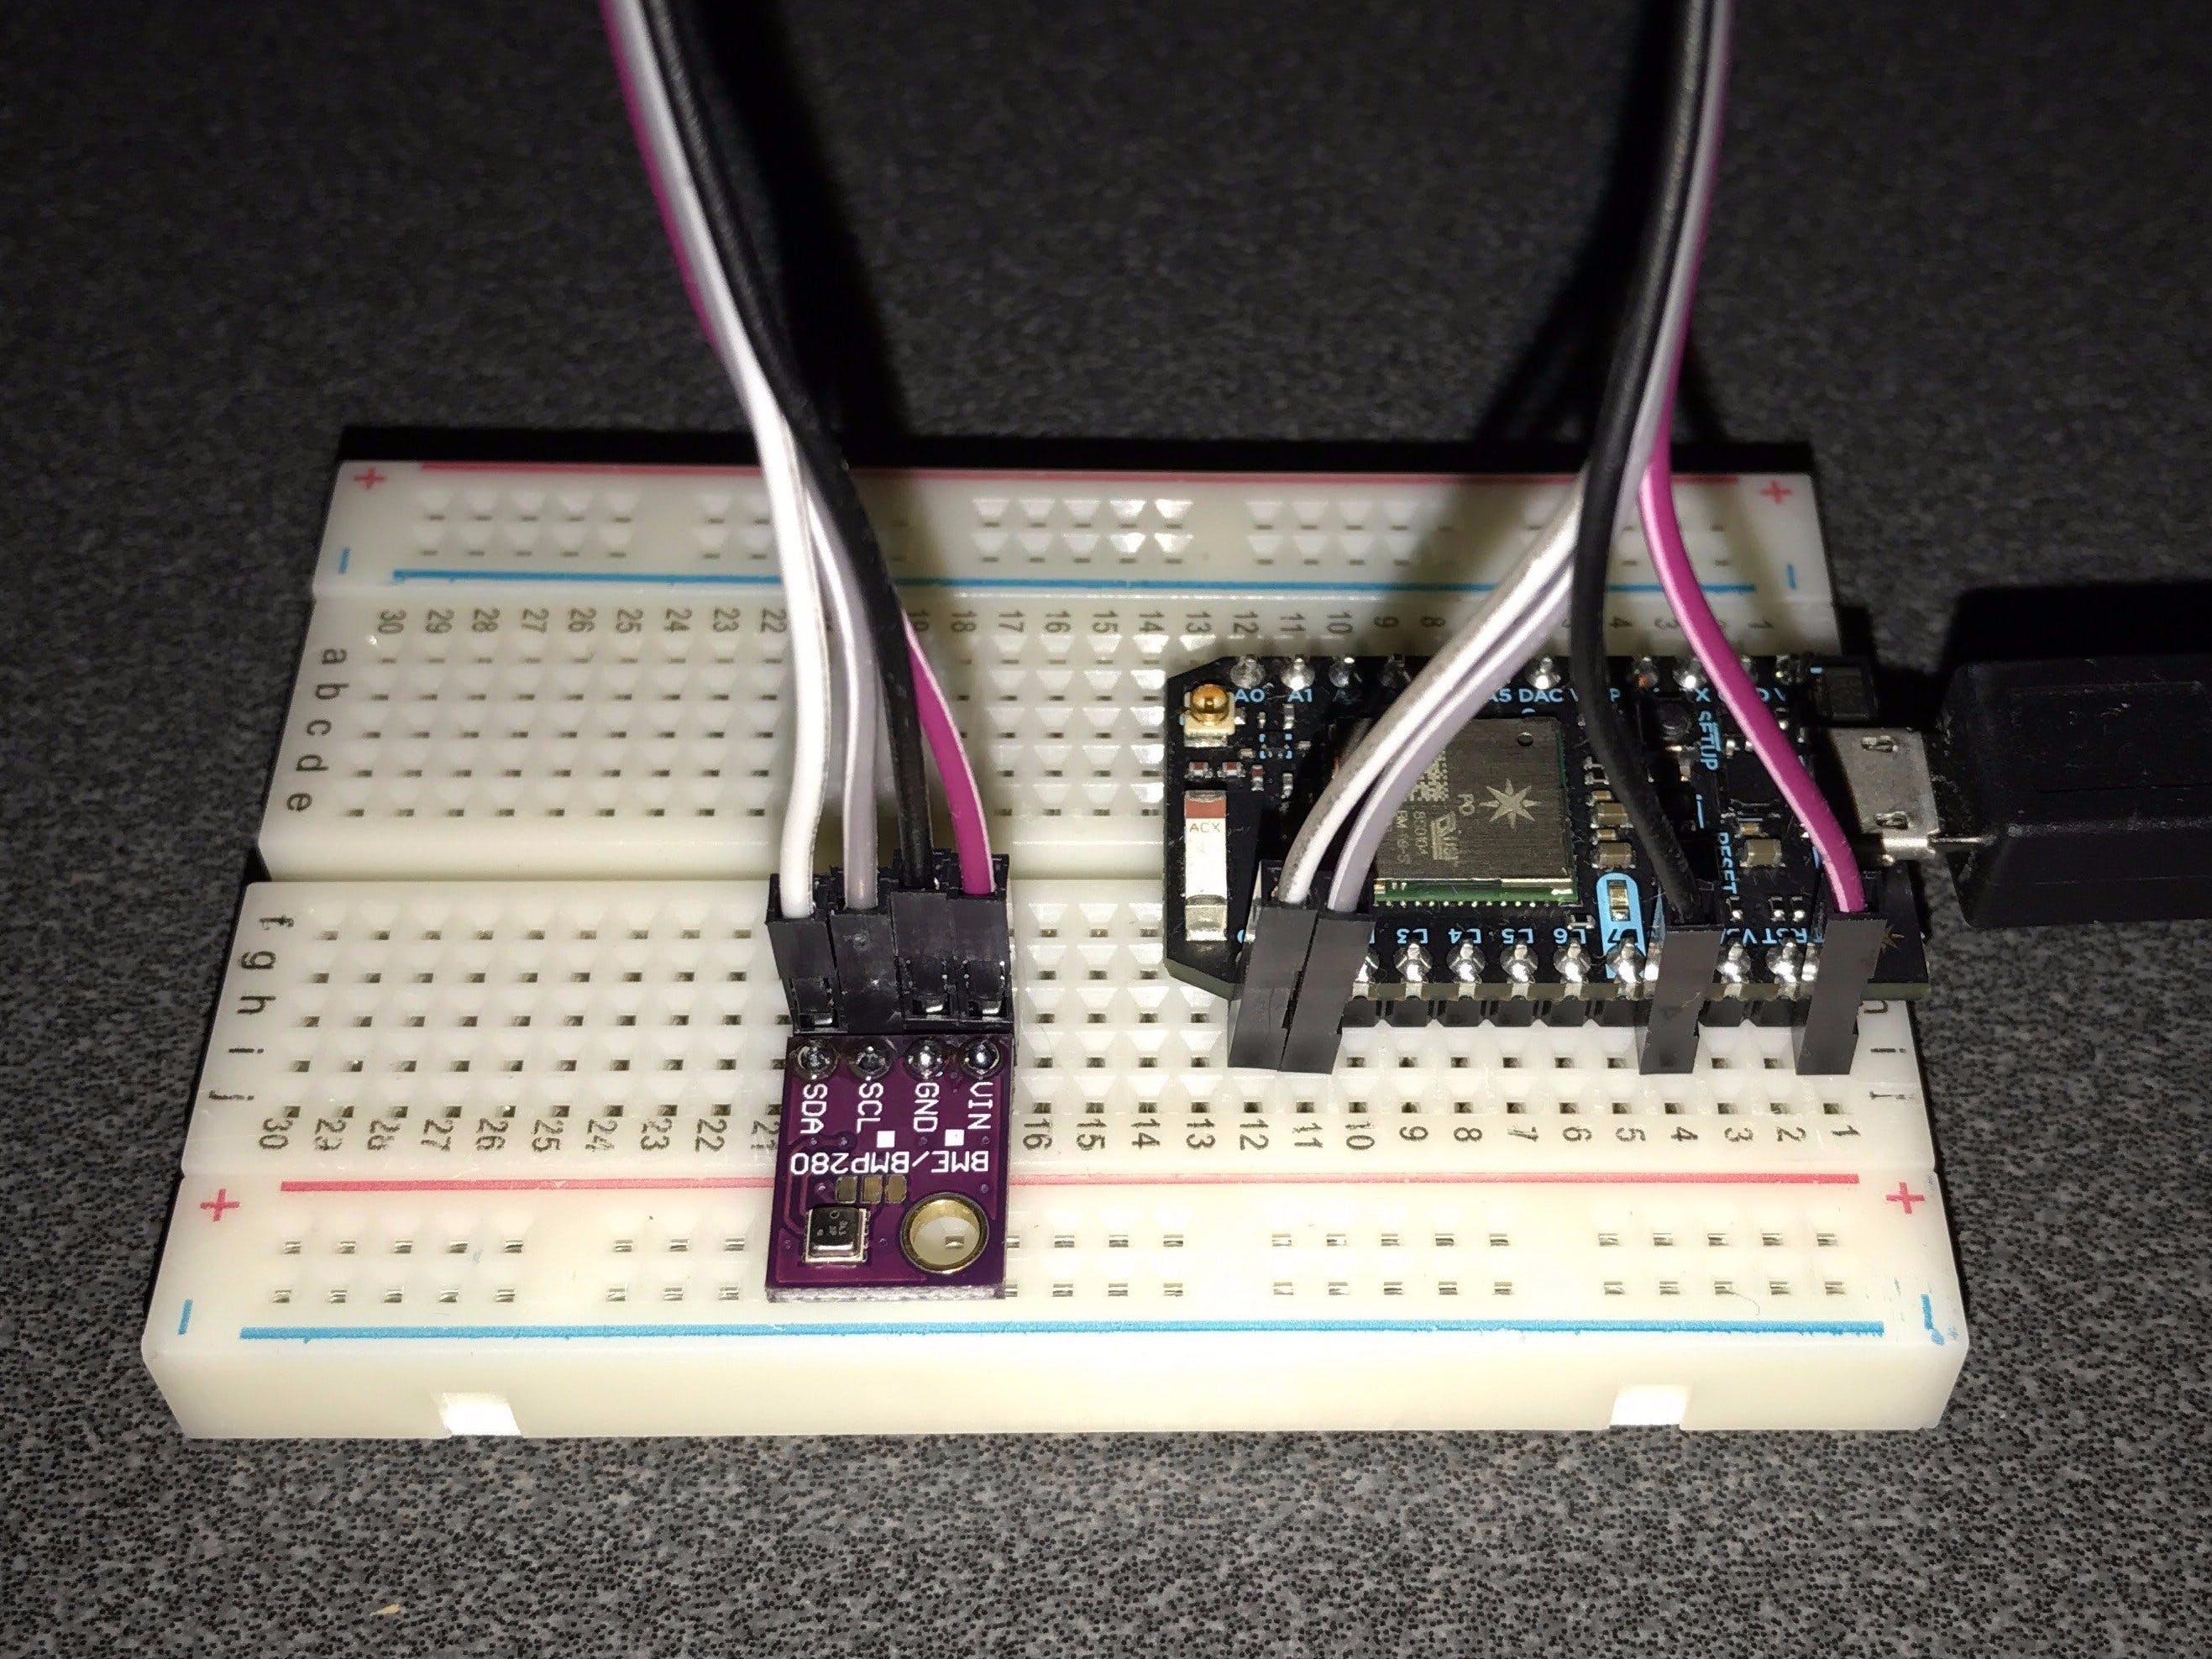 BME280 Thingspeak Particle Bridge